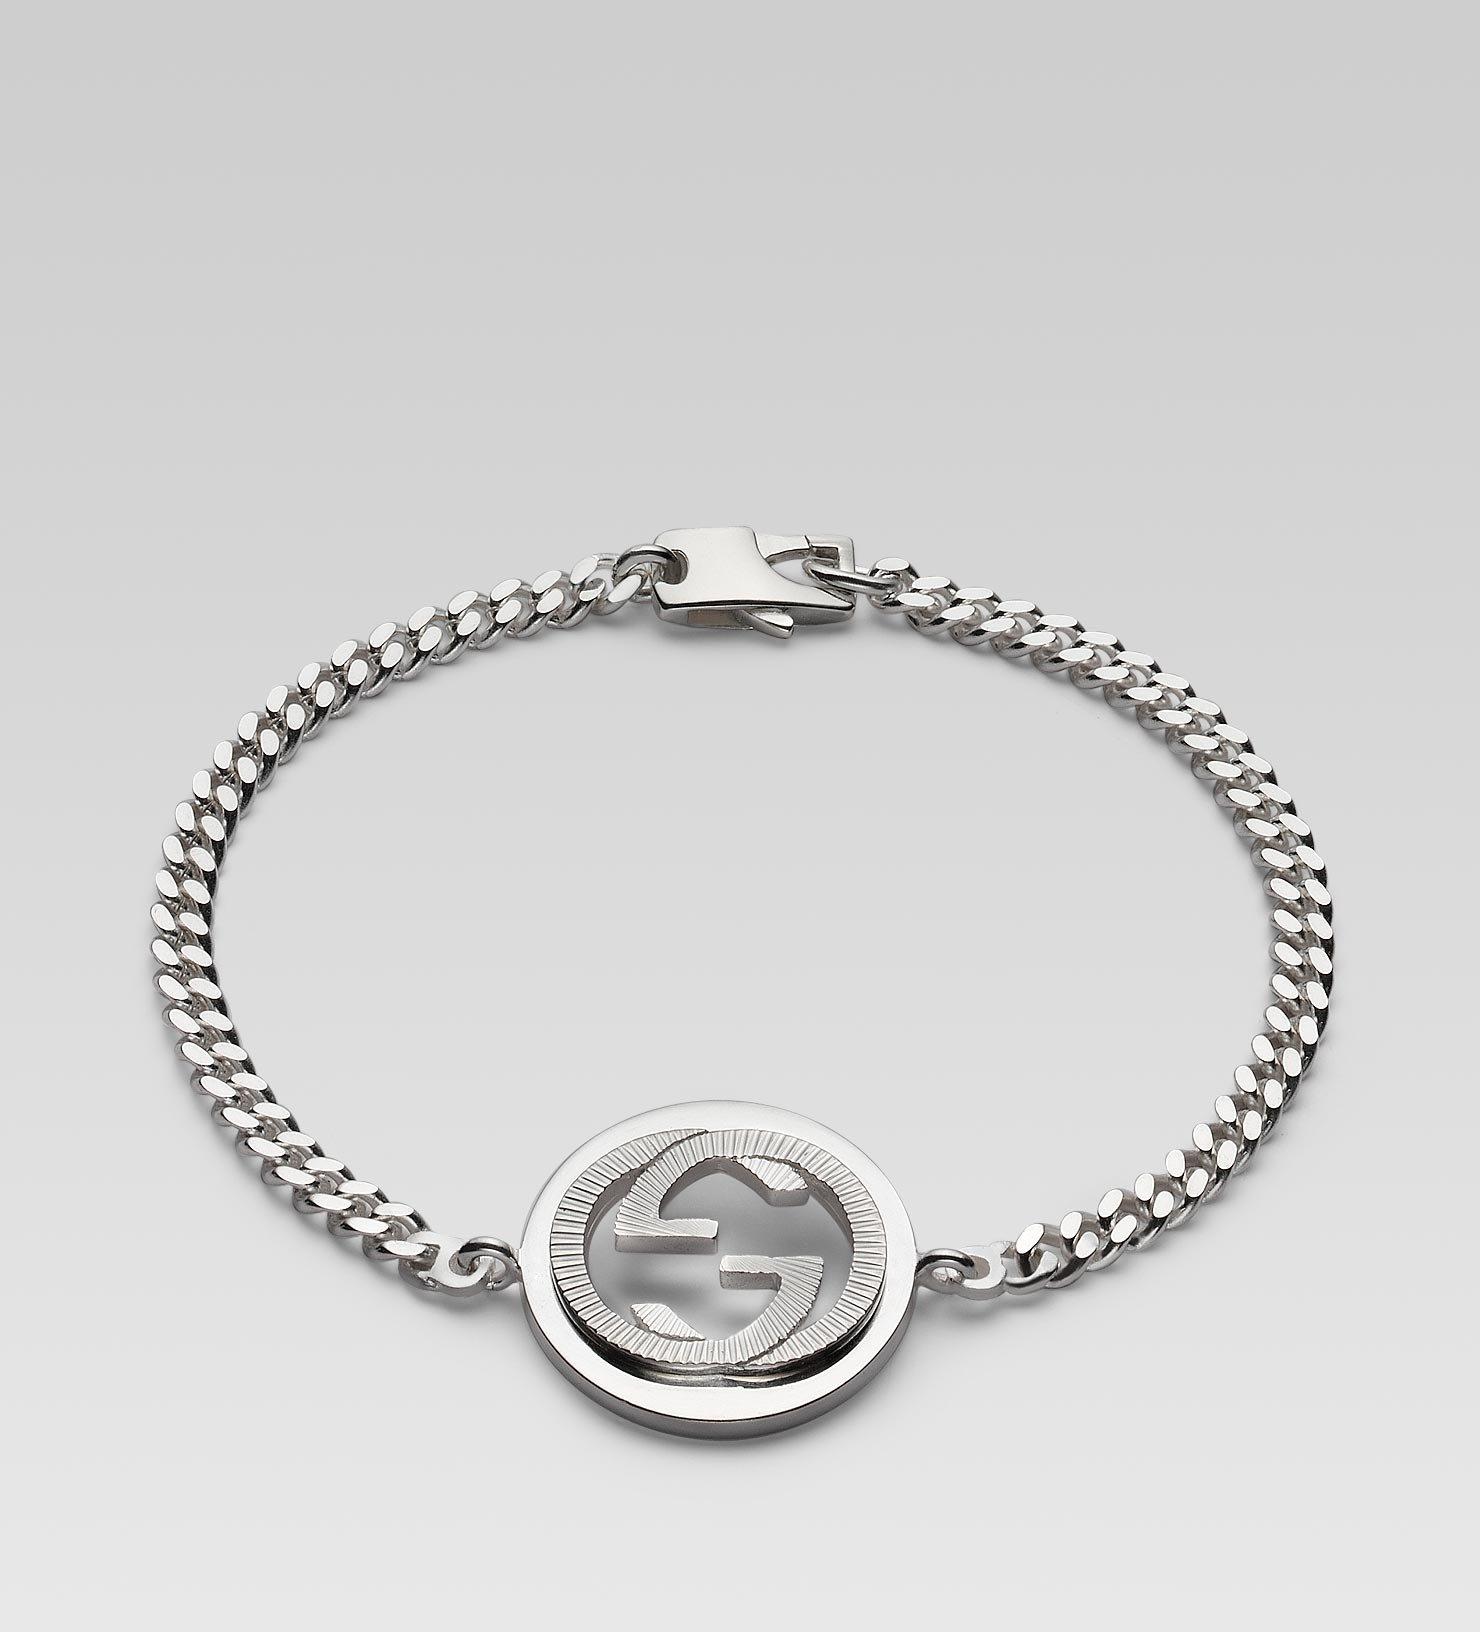 Gucci Bracelet With Interlocking Guilloch 233 G Motif In